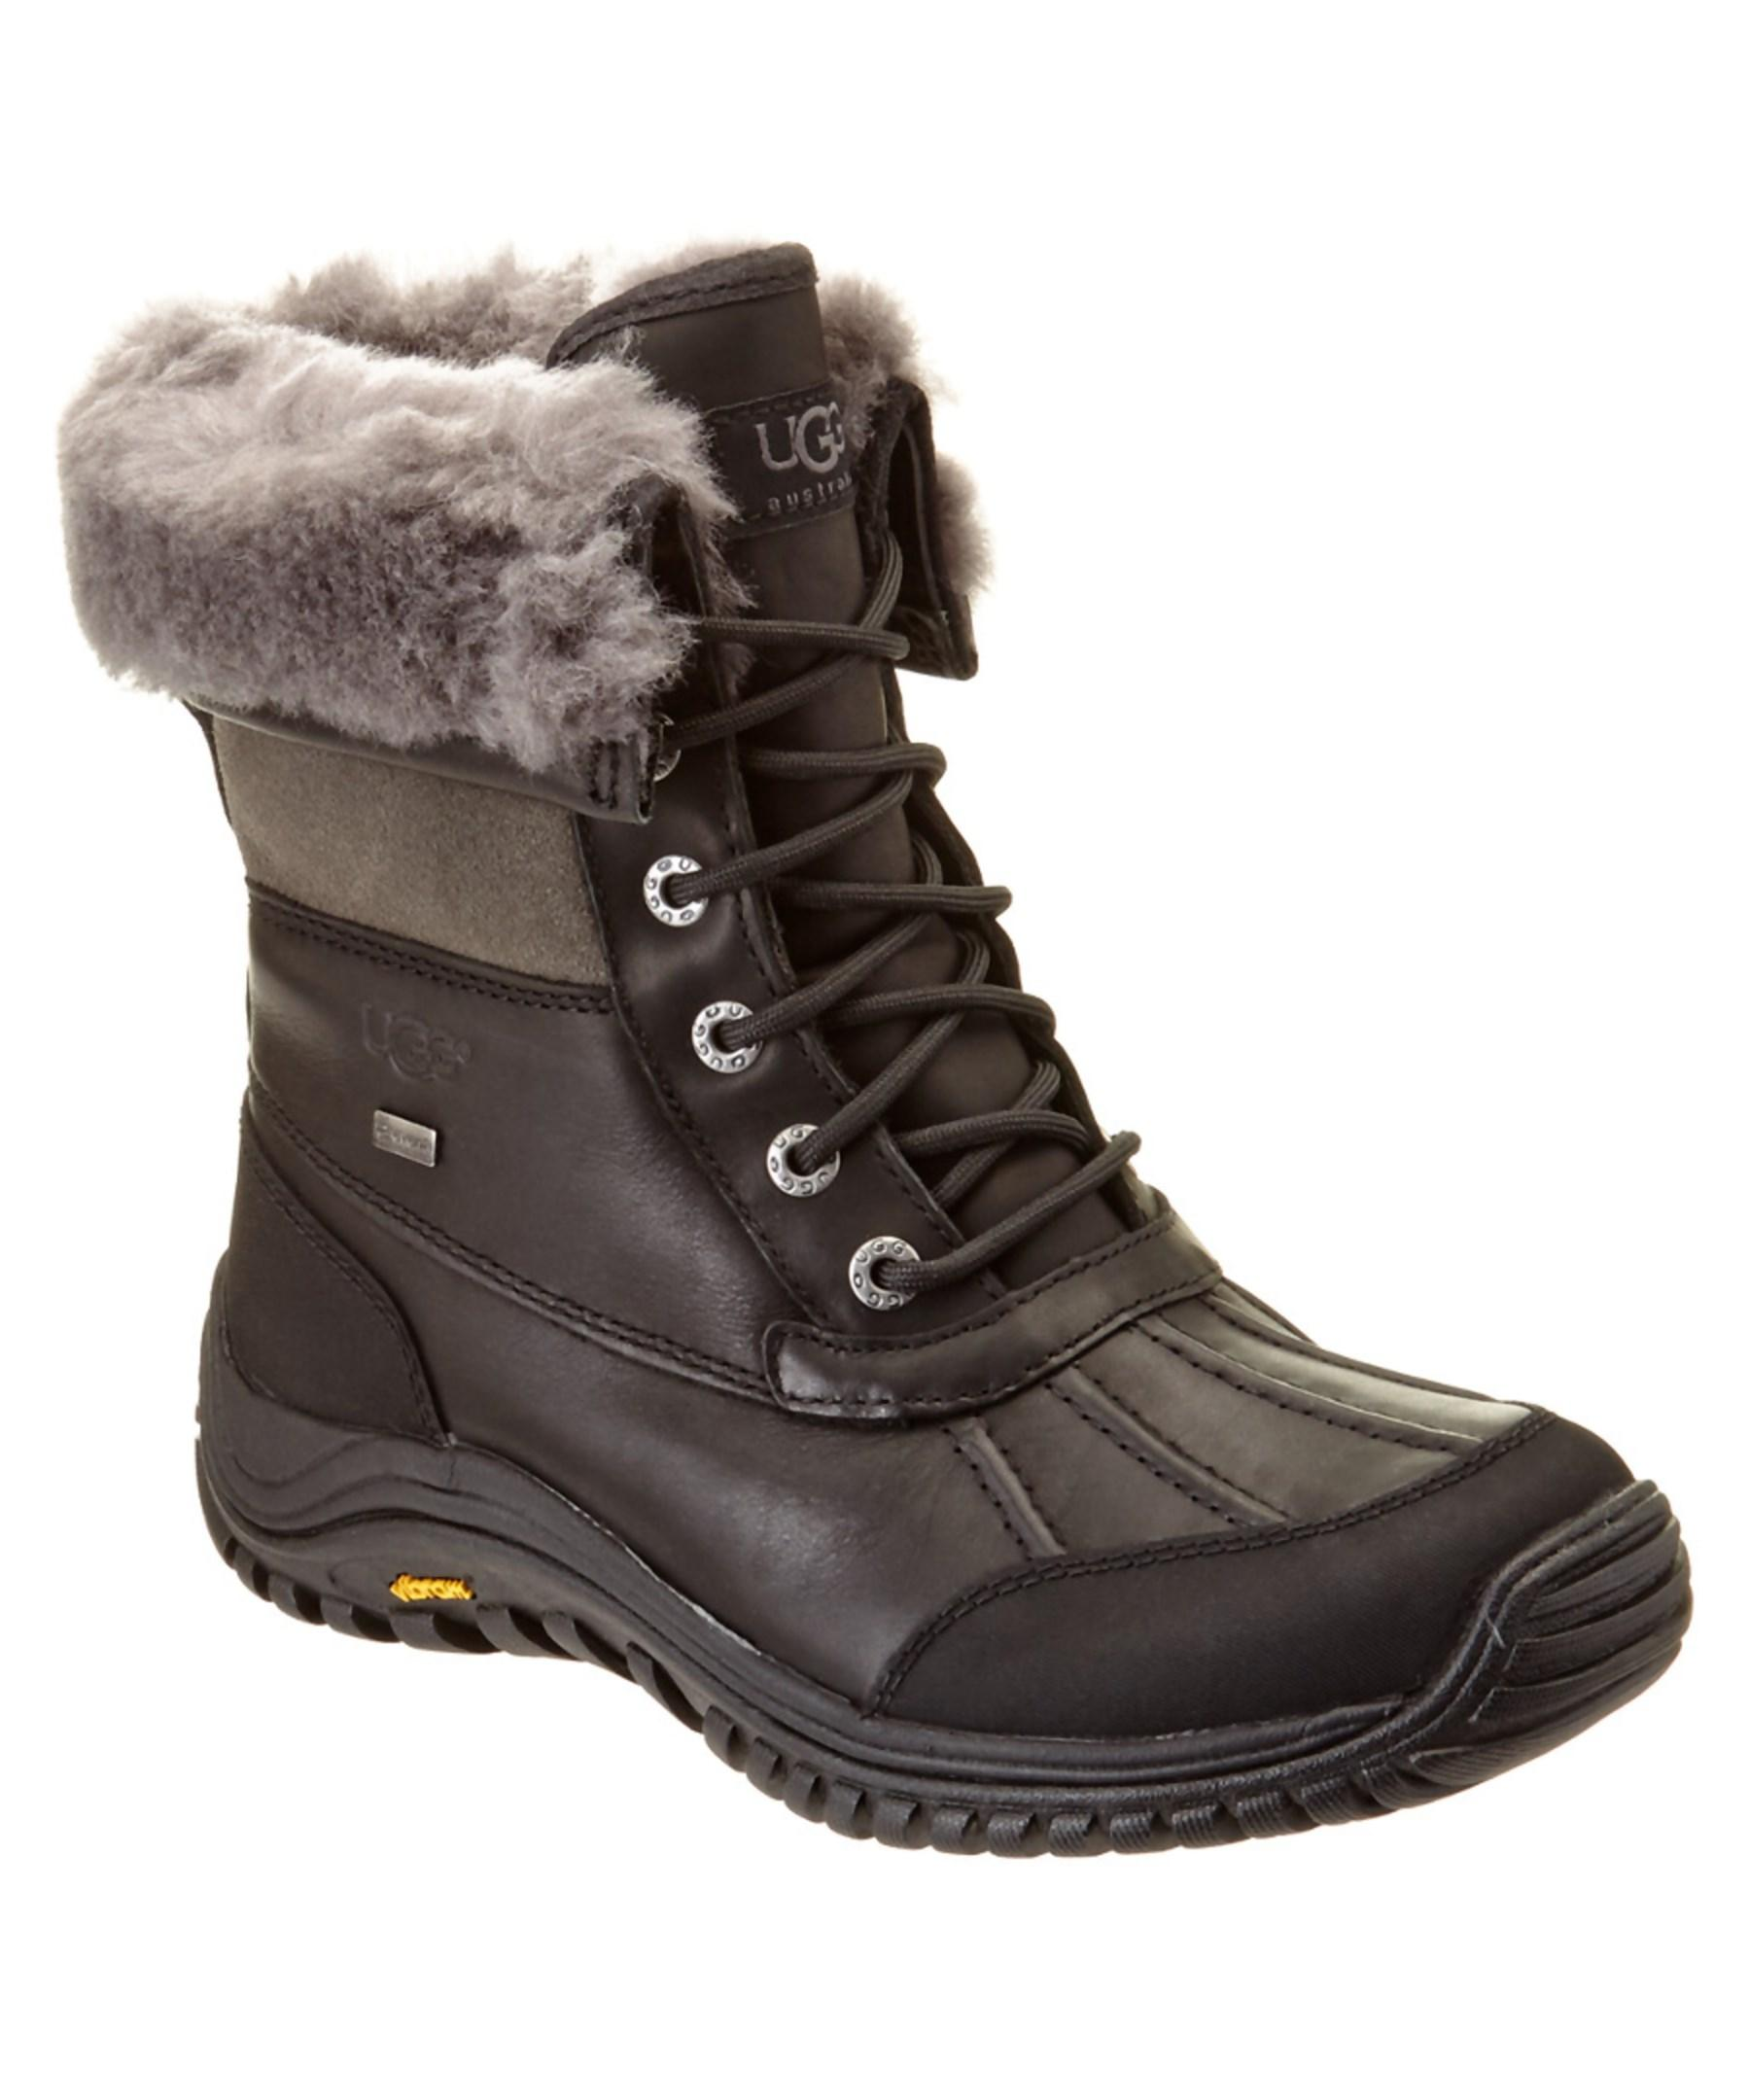 ugg s adirondack waterproof leather boot in black lyst